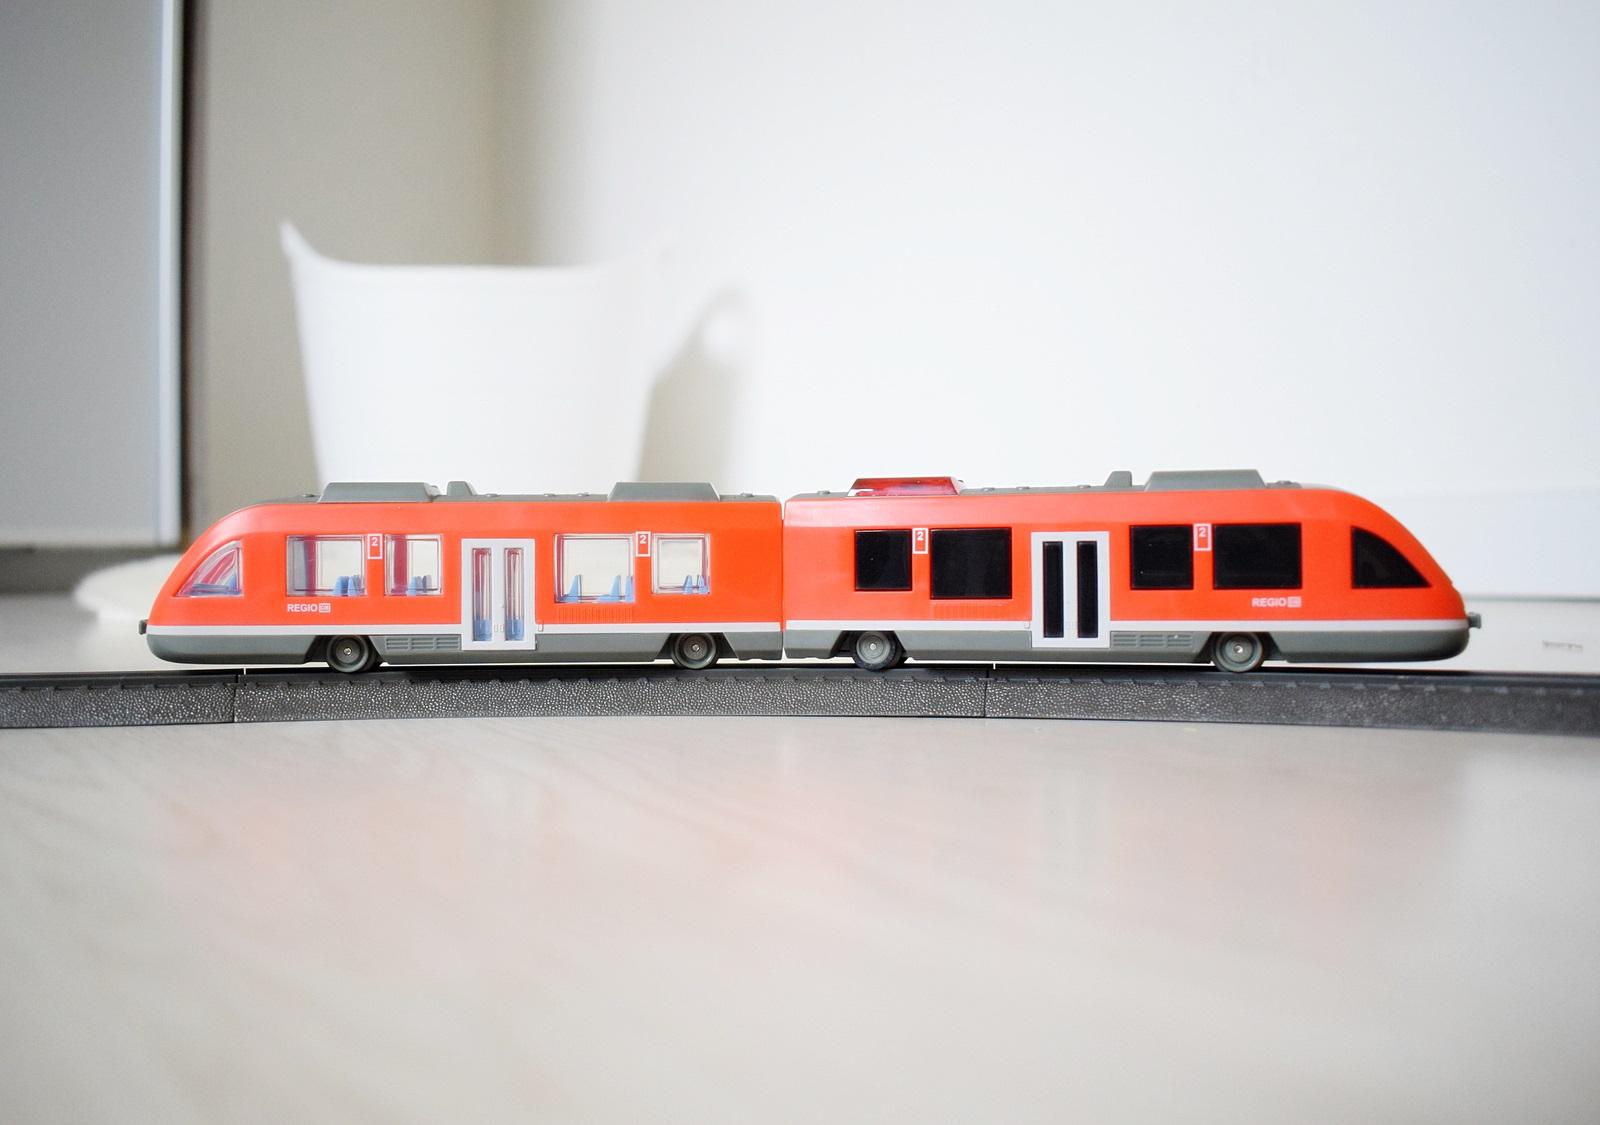 modelleisenbahn-kinder